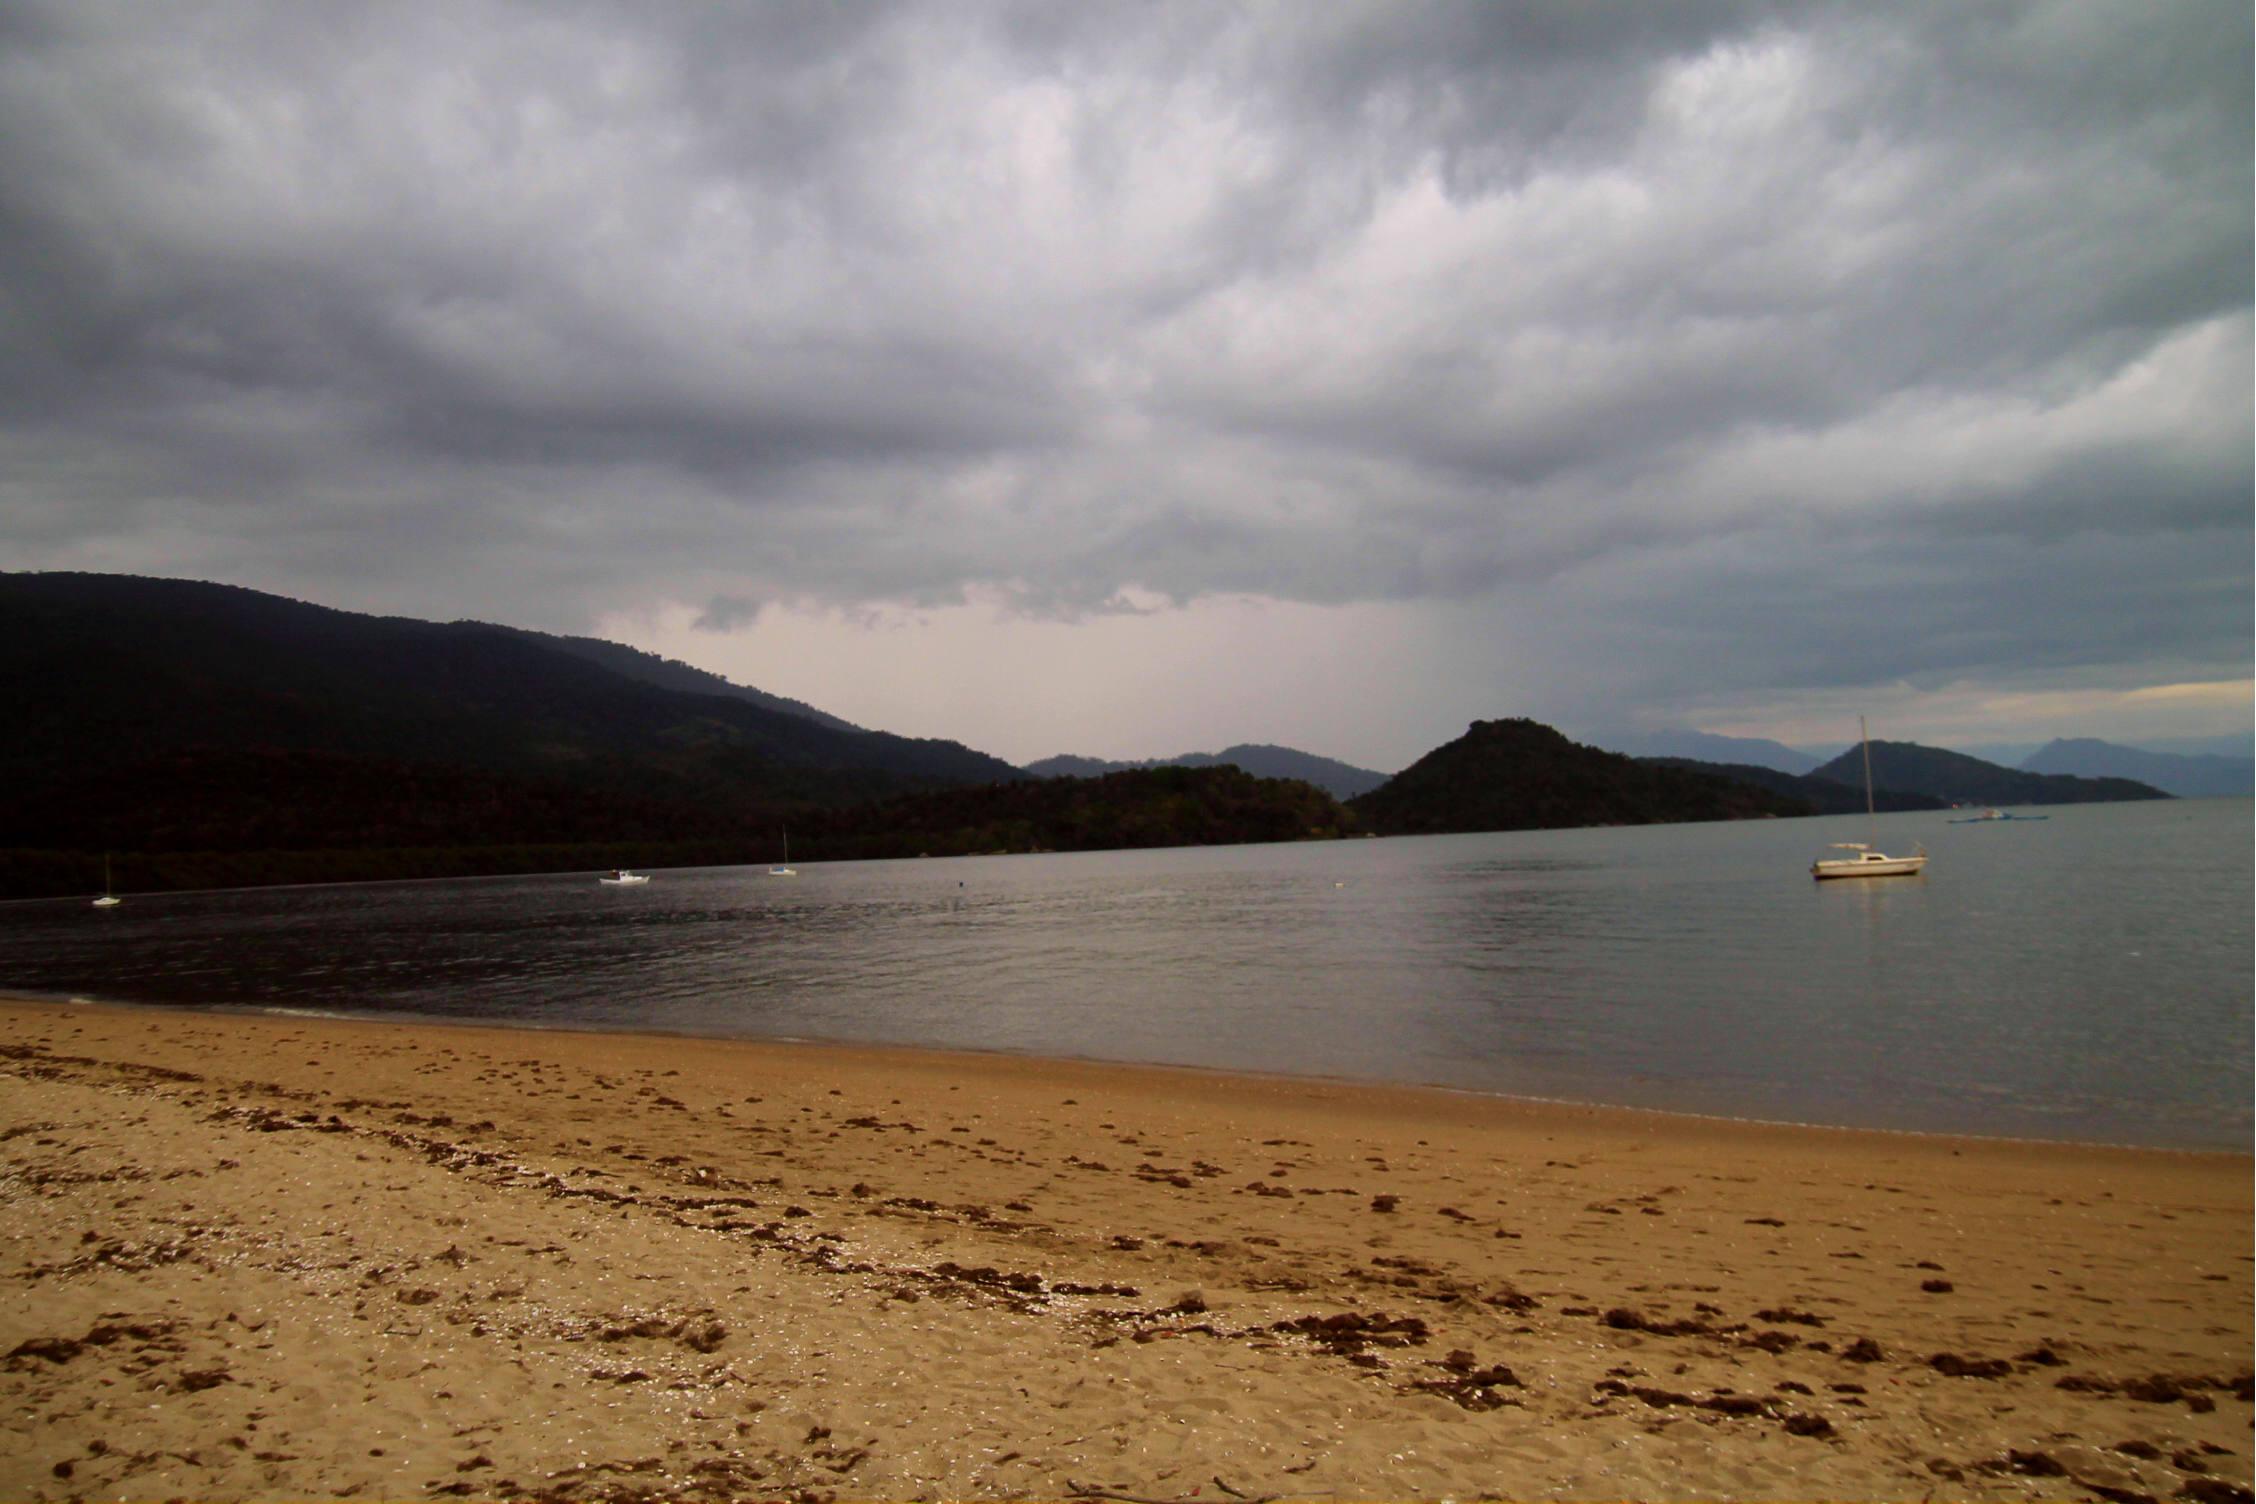 Praia do Jabaquara, em Paraty (Foto: Thaís Sabino)